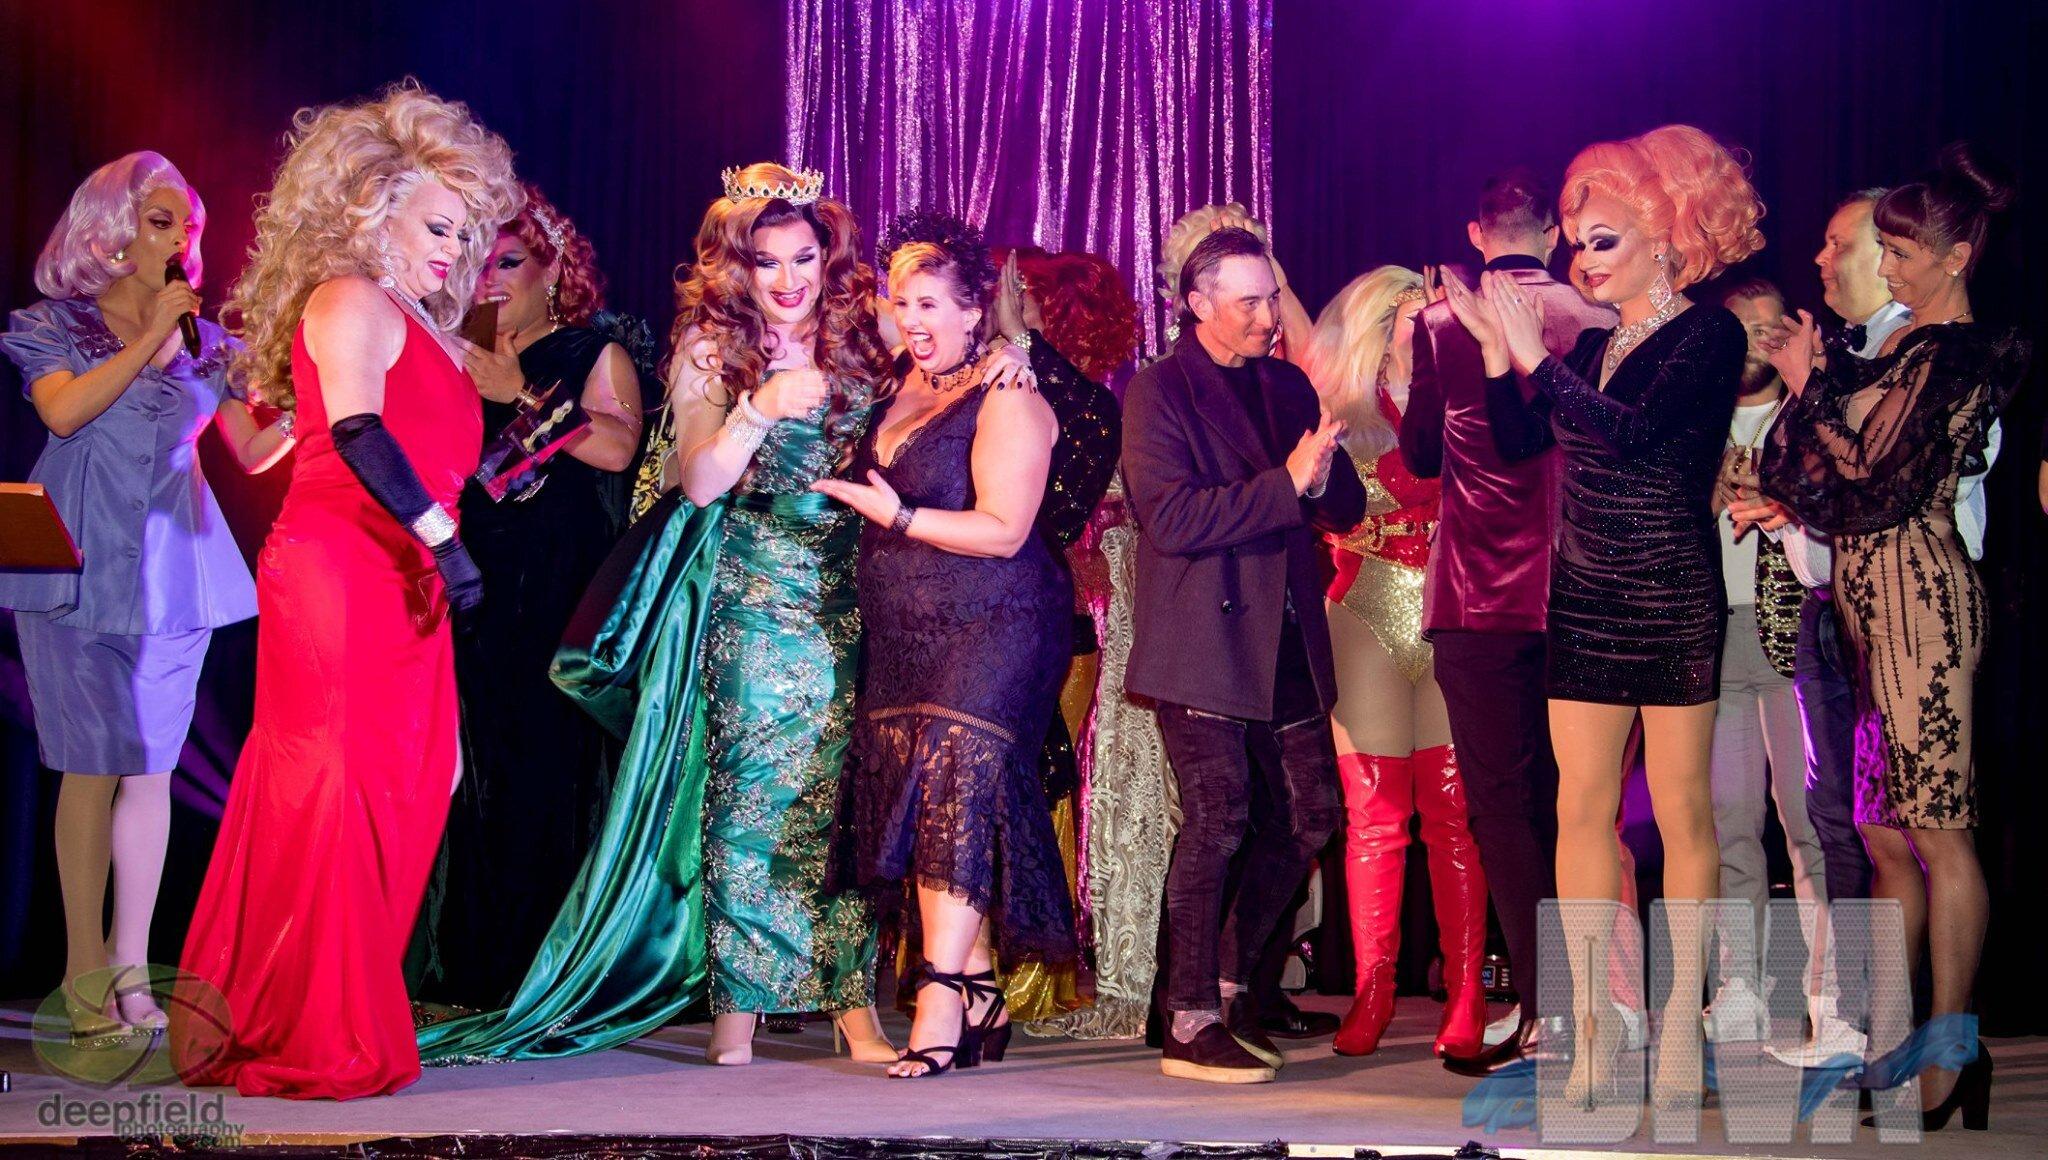 sstonewall-hotel-charisma-belle-winner-venue-of-the-year-win-diva-awards-sydney-drag-queen-royalty-best-hire-drag-race-australia.jpg